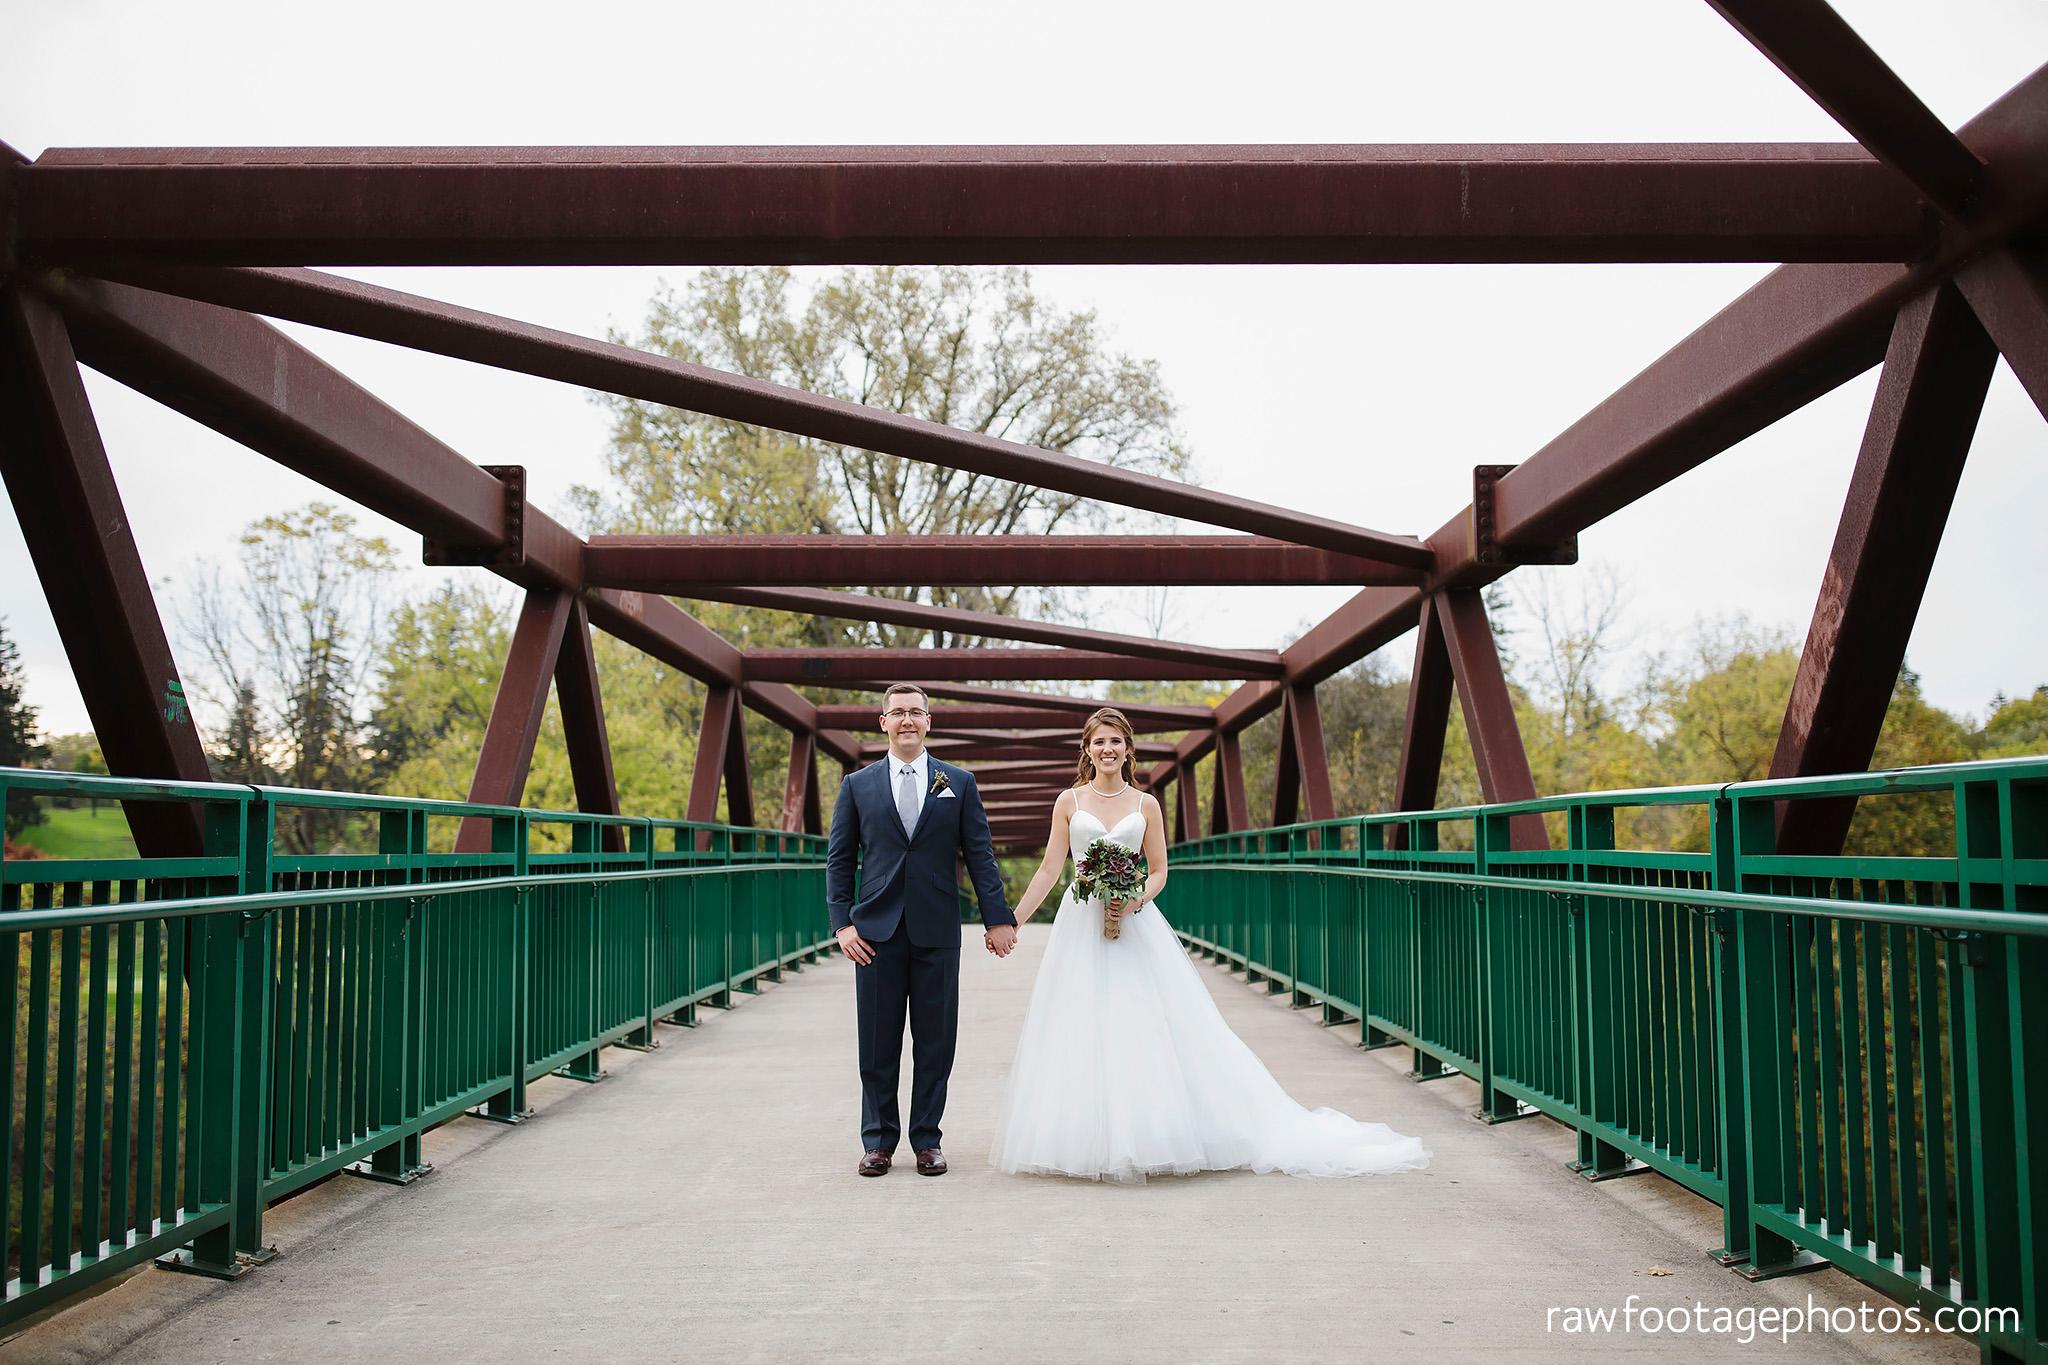 london_ontario_wedding_photographer-civic_gardens-springbank_park-succulent_bouquet-fall_wedding-bridge-raw_footage_photography063.jpg